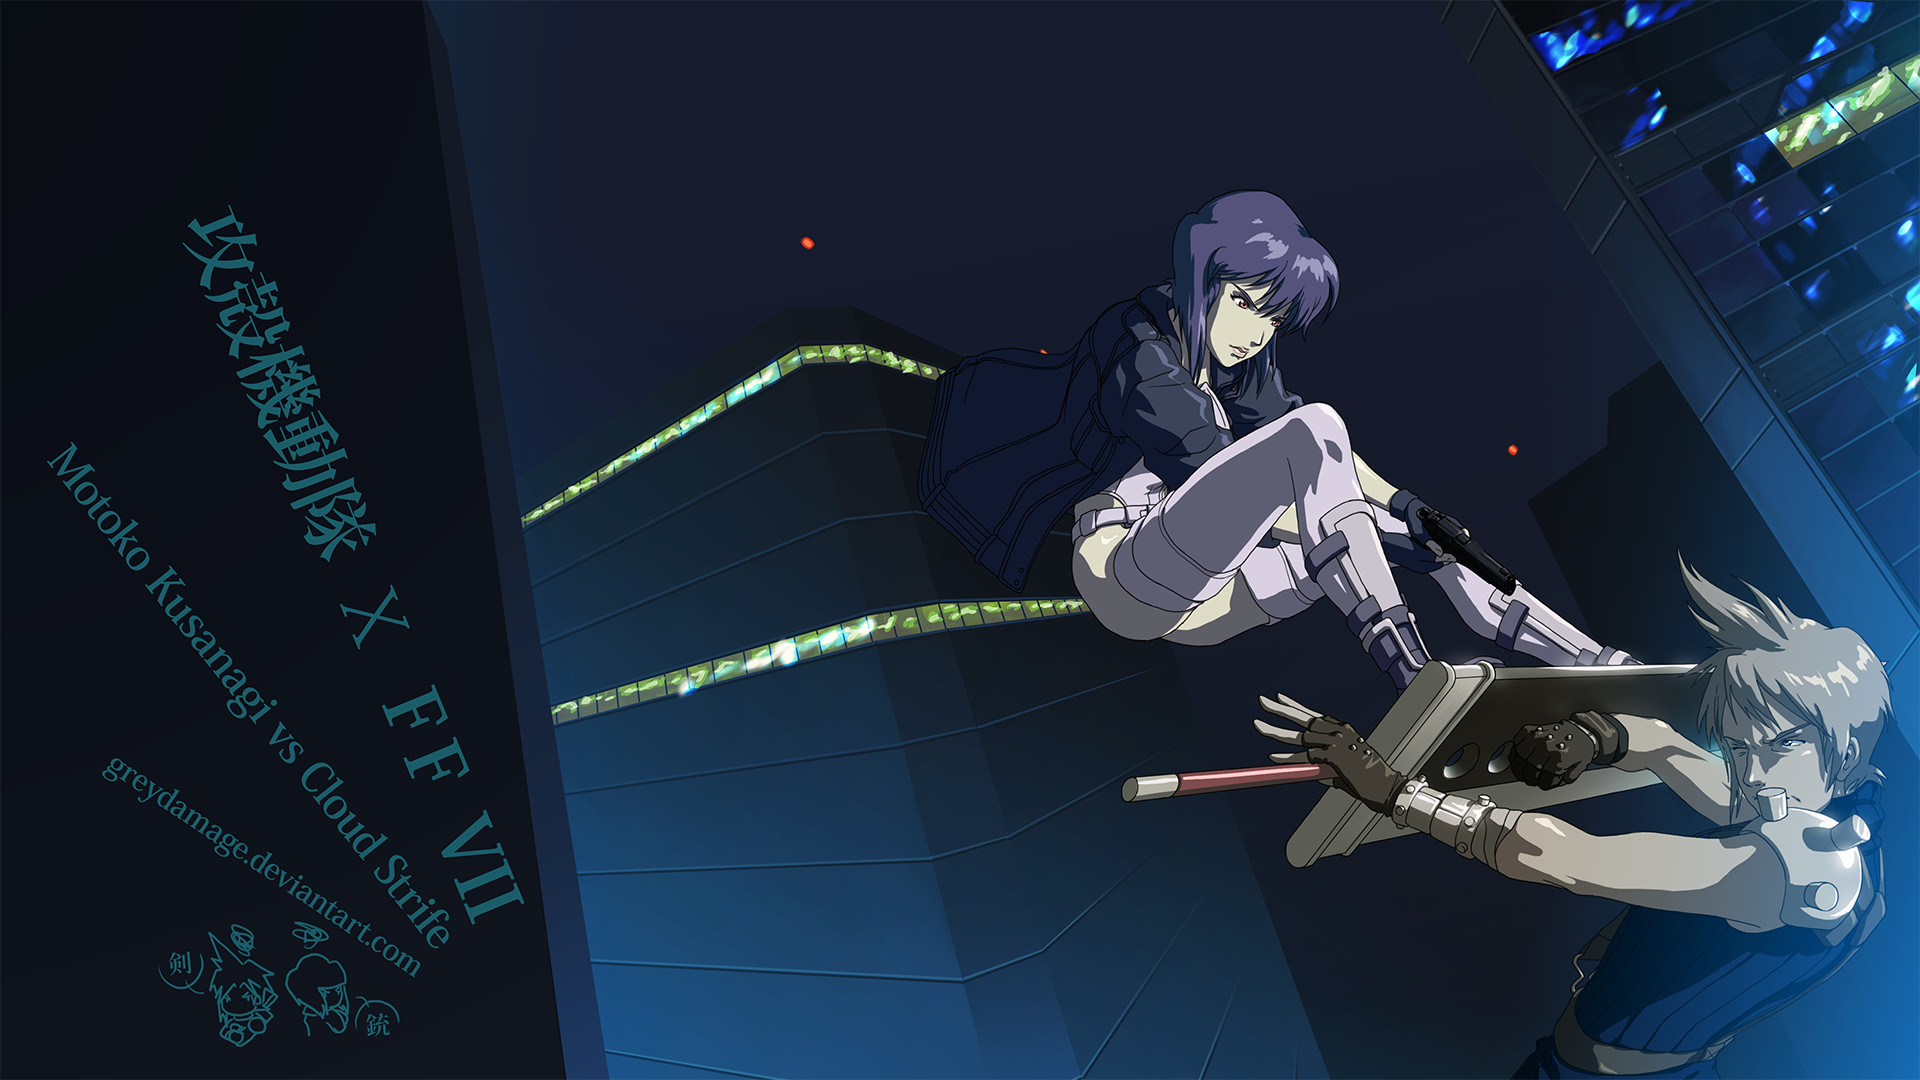 Final Fantasy Fight Motoko Kusanagi Anime Cloud Strife Ghost in the Shell  videogames wallpaper | | 48411 | WallpaperUP